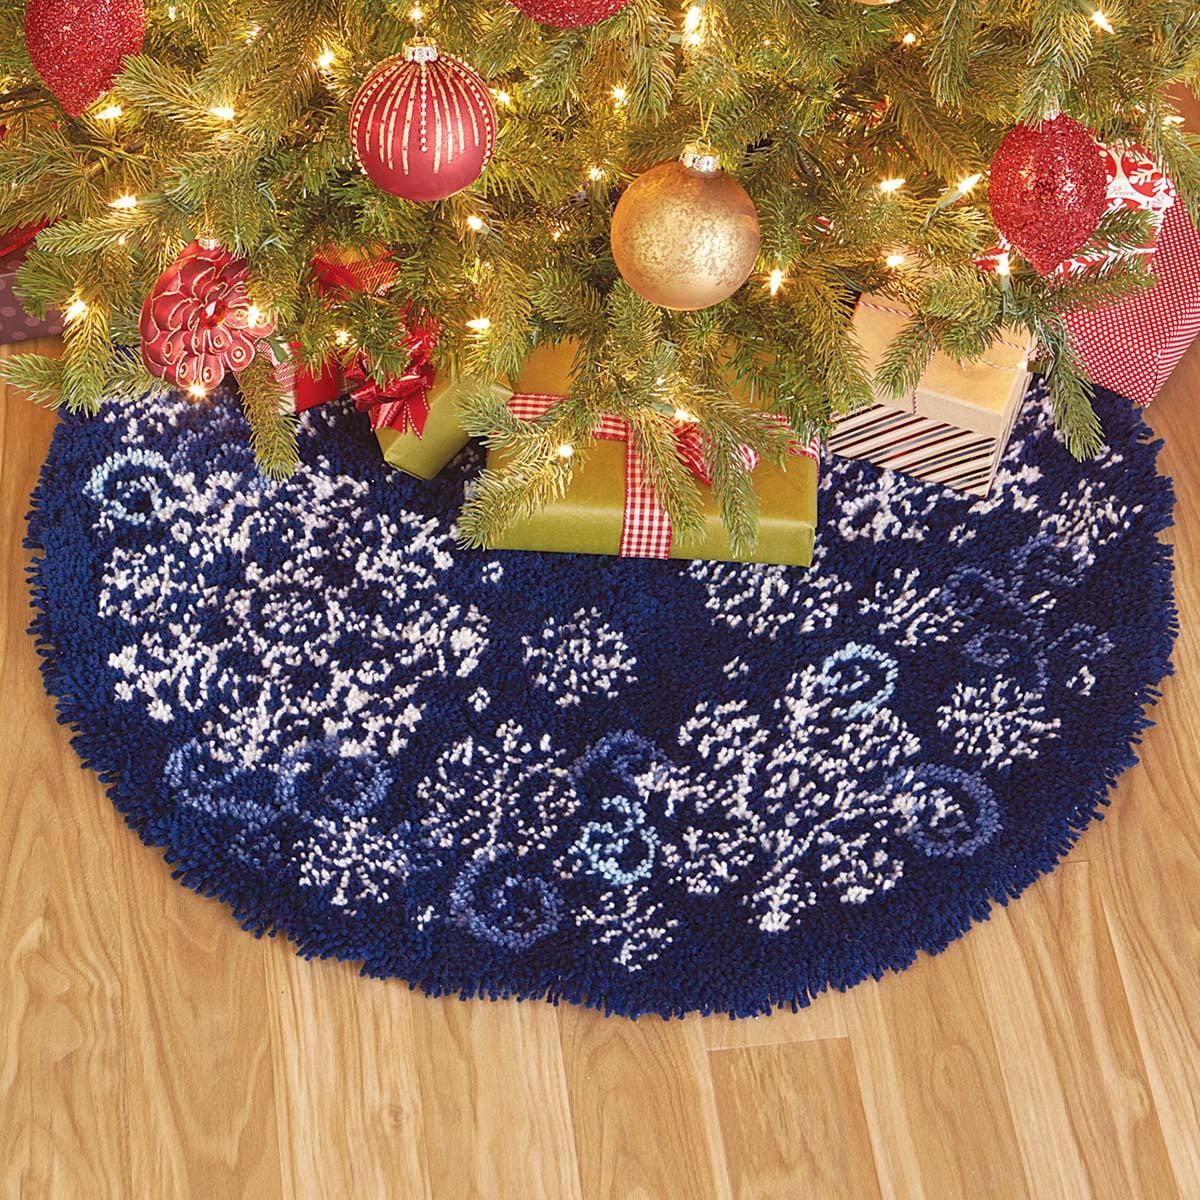 Herrschners® Snowflakes and Swirls Tree Skirt Latch Hook Kit